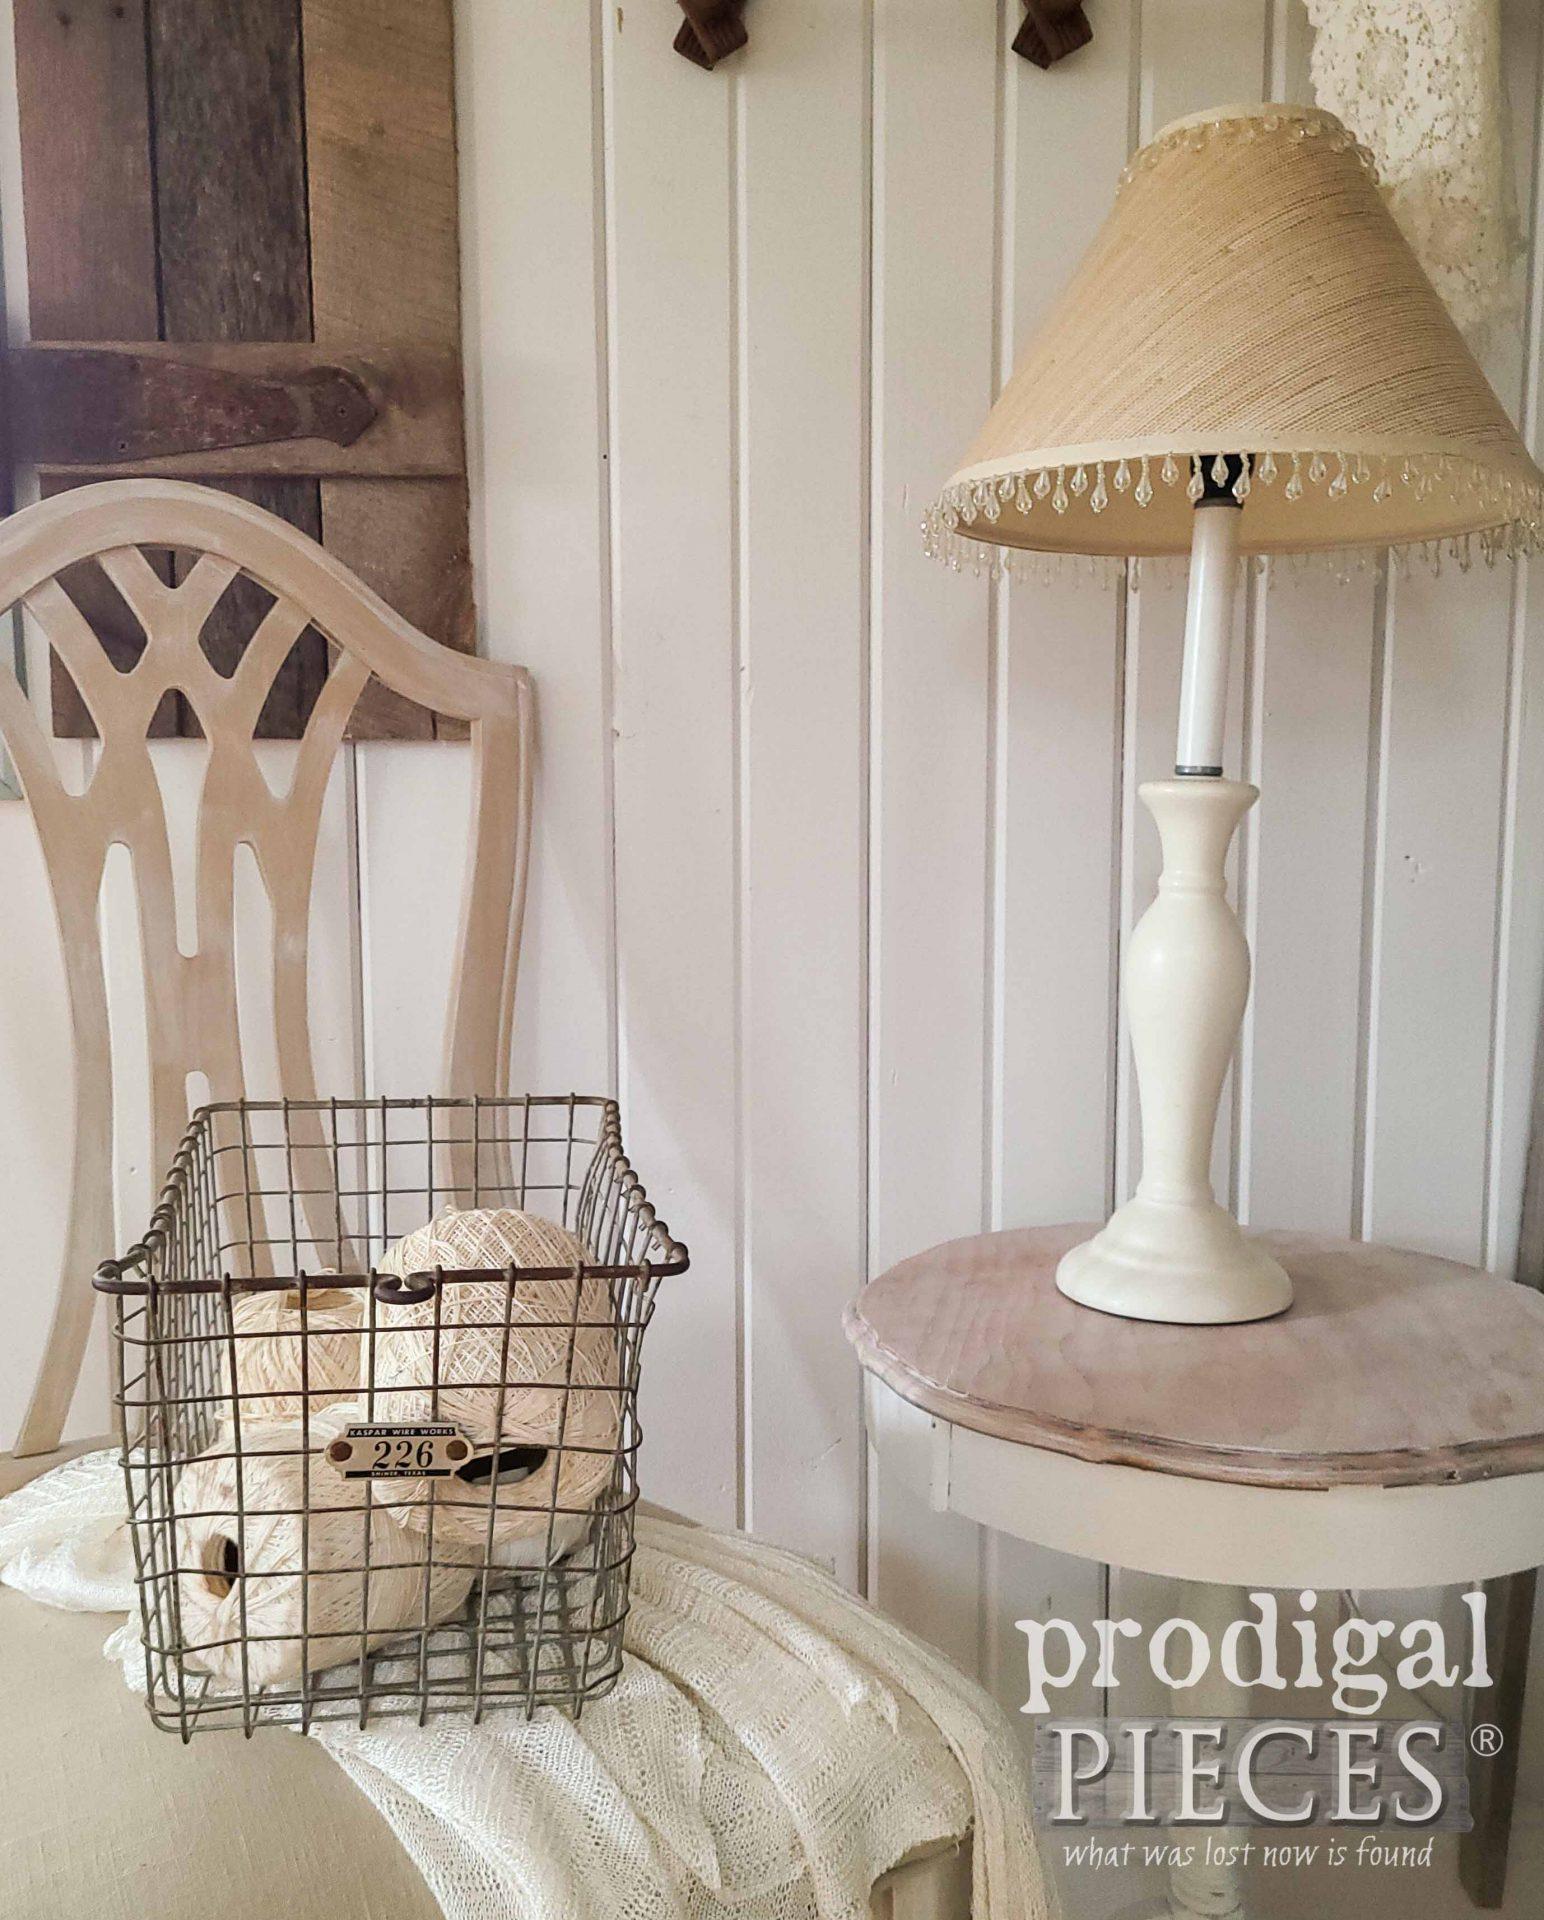 Farmhouse Style Decor by Larissa of Prodigal Pieces | prodigalpieces.com #prodigalpieces #vignette #farmhouse #vintage #home #homedecor